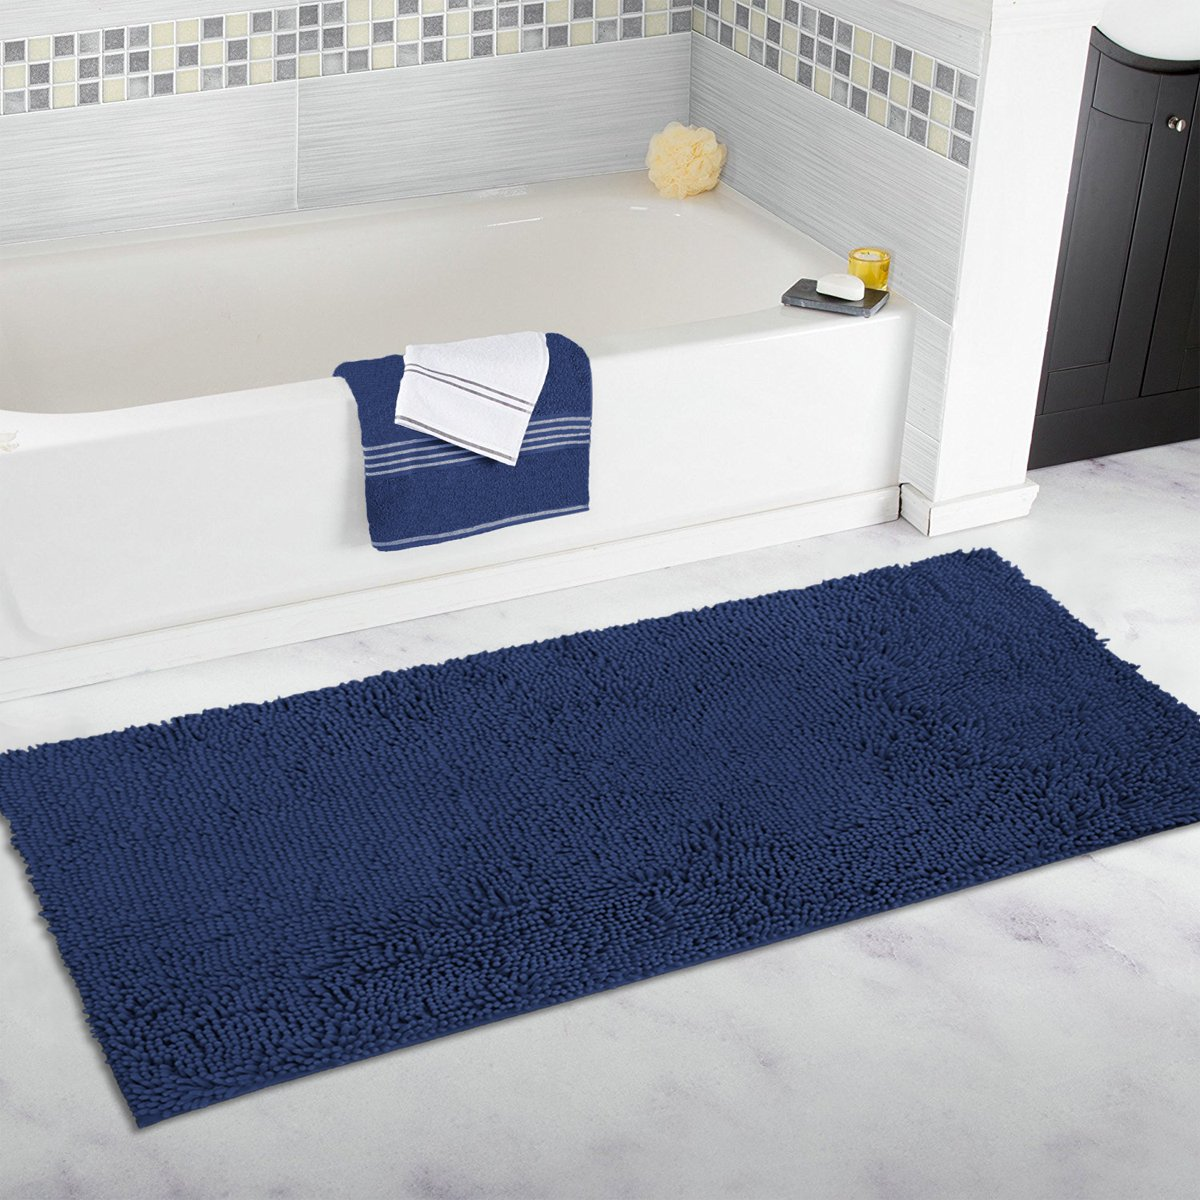 Mayshine Memory Foam Bath Mat Runner Non-Slip Water Absorbent Luxury Soft Bathro